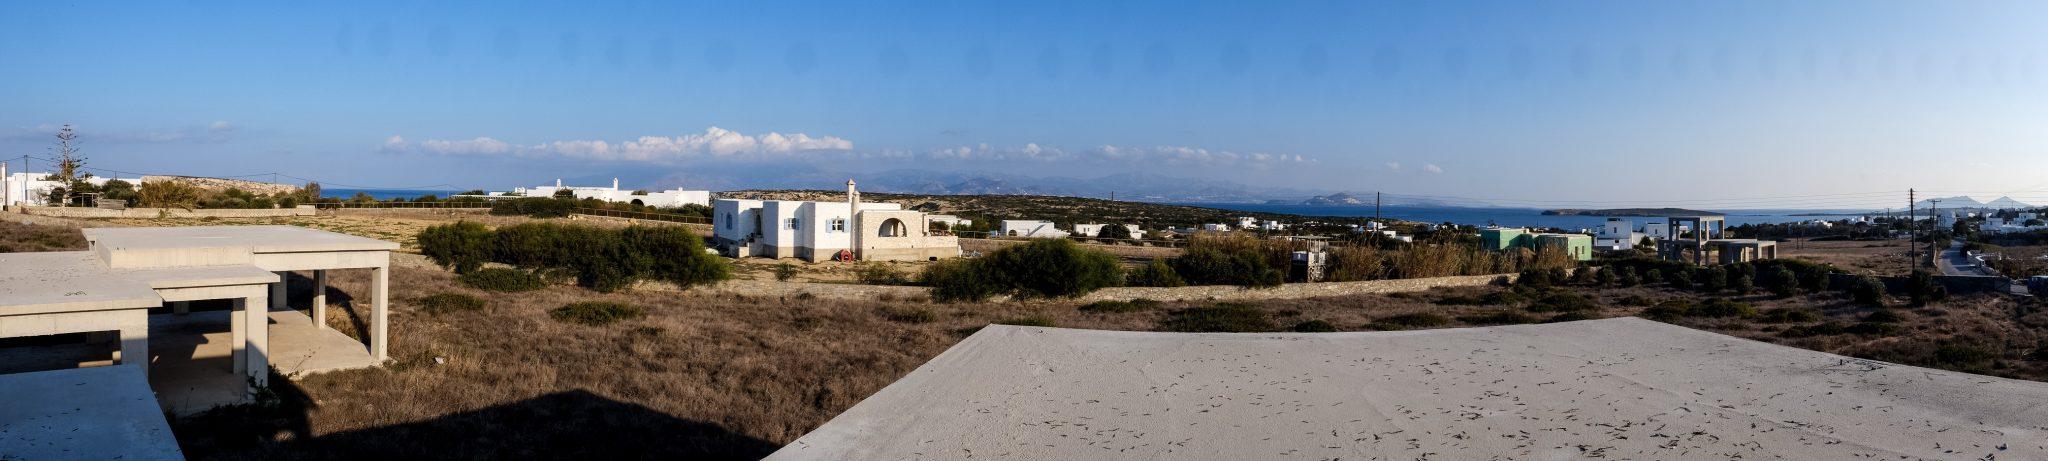 Terrain, Paros - Ref GR-5014